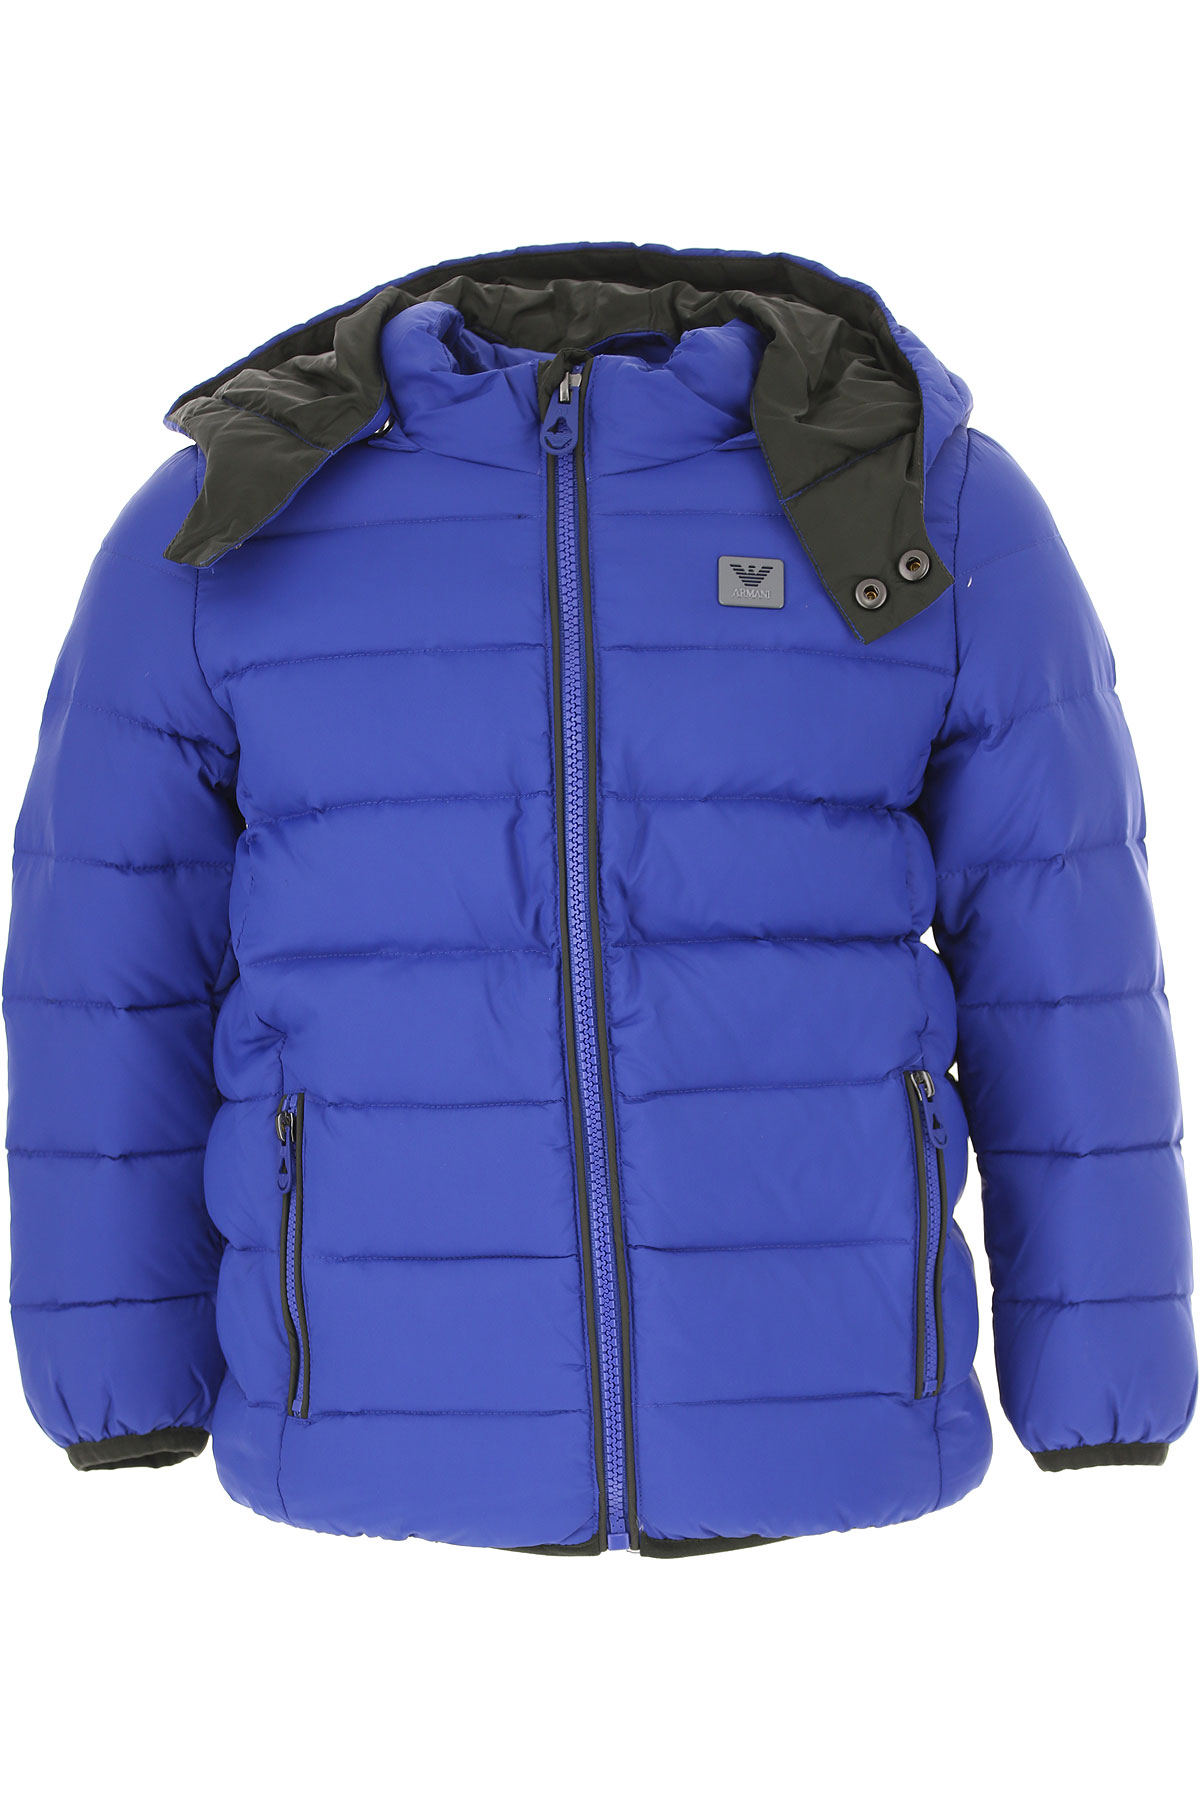 27f6964c2 Kidswear Emporio Armani